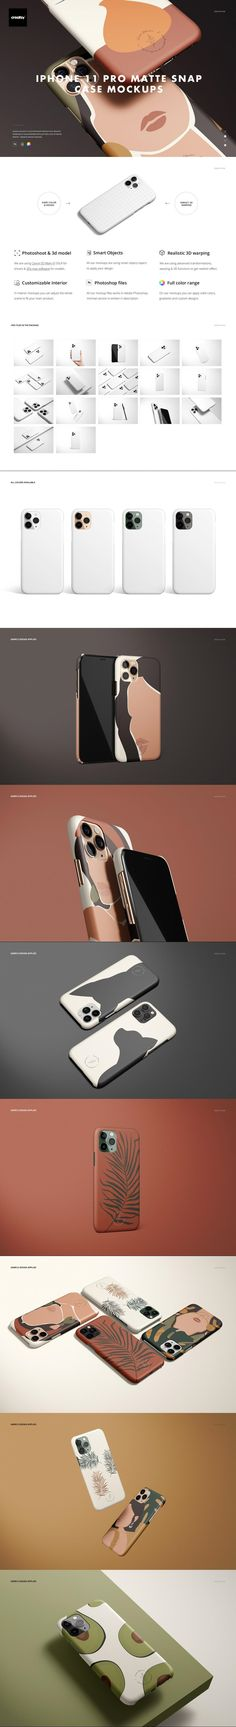 iPhone 11 Pro Matte Snap Case Mockup #shadowoverlay #mockup #phone #online #etsy #pinteresttemplate #moodboardmockup #sketchbook #printable #photo #creatsy #kidfriendlyscene #device #tile #sublimation #fuji #trucks #MockupTemplate #template Polaroid Frame, Mockup Templates, Instagram Story, Iphone 11, 2d, Letter, Feminine, Printing, Printable